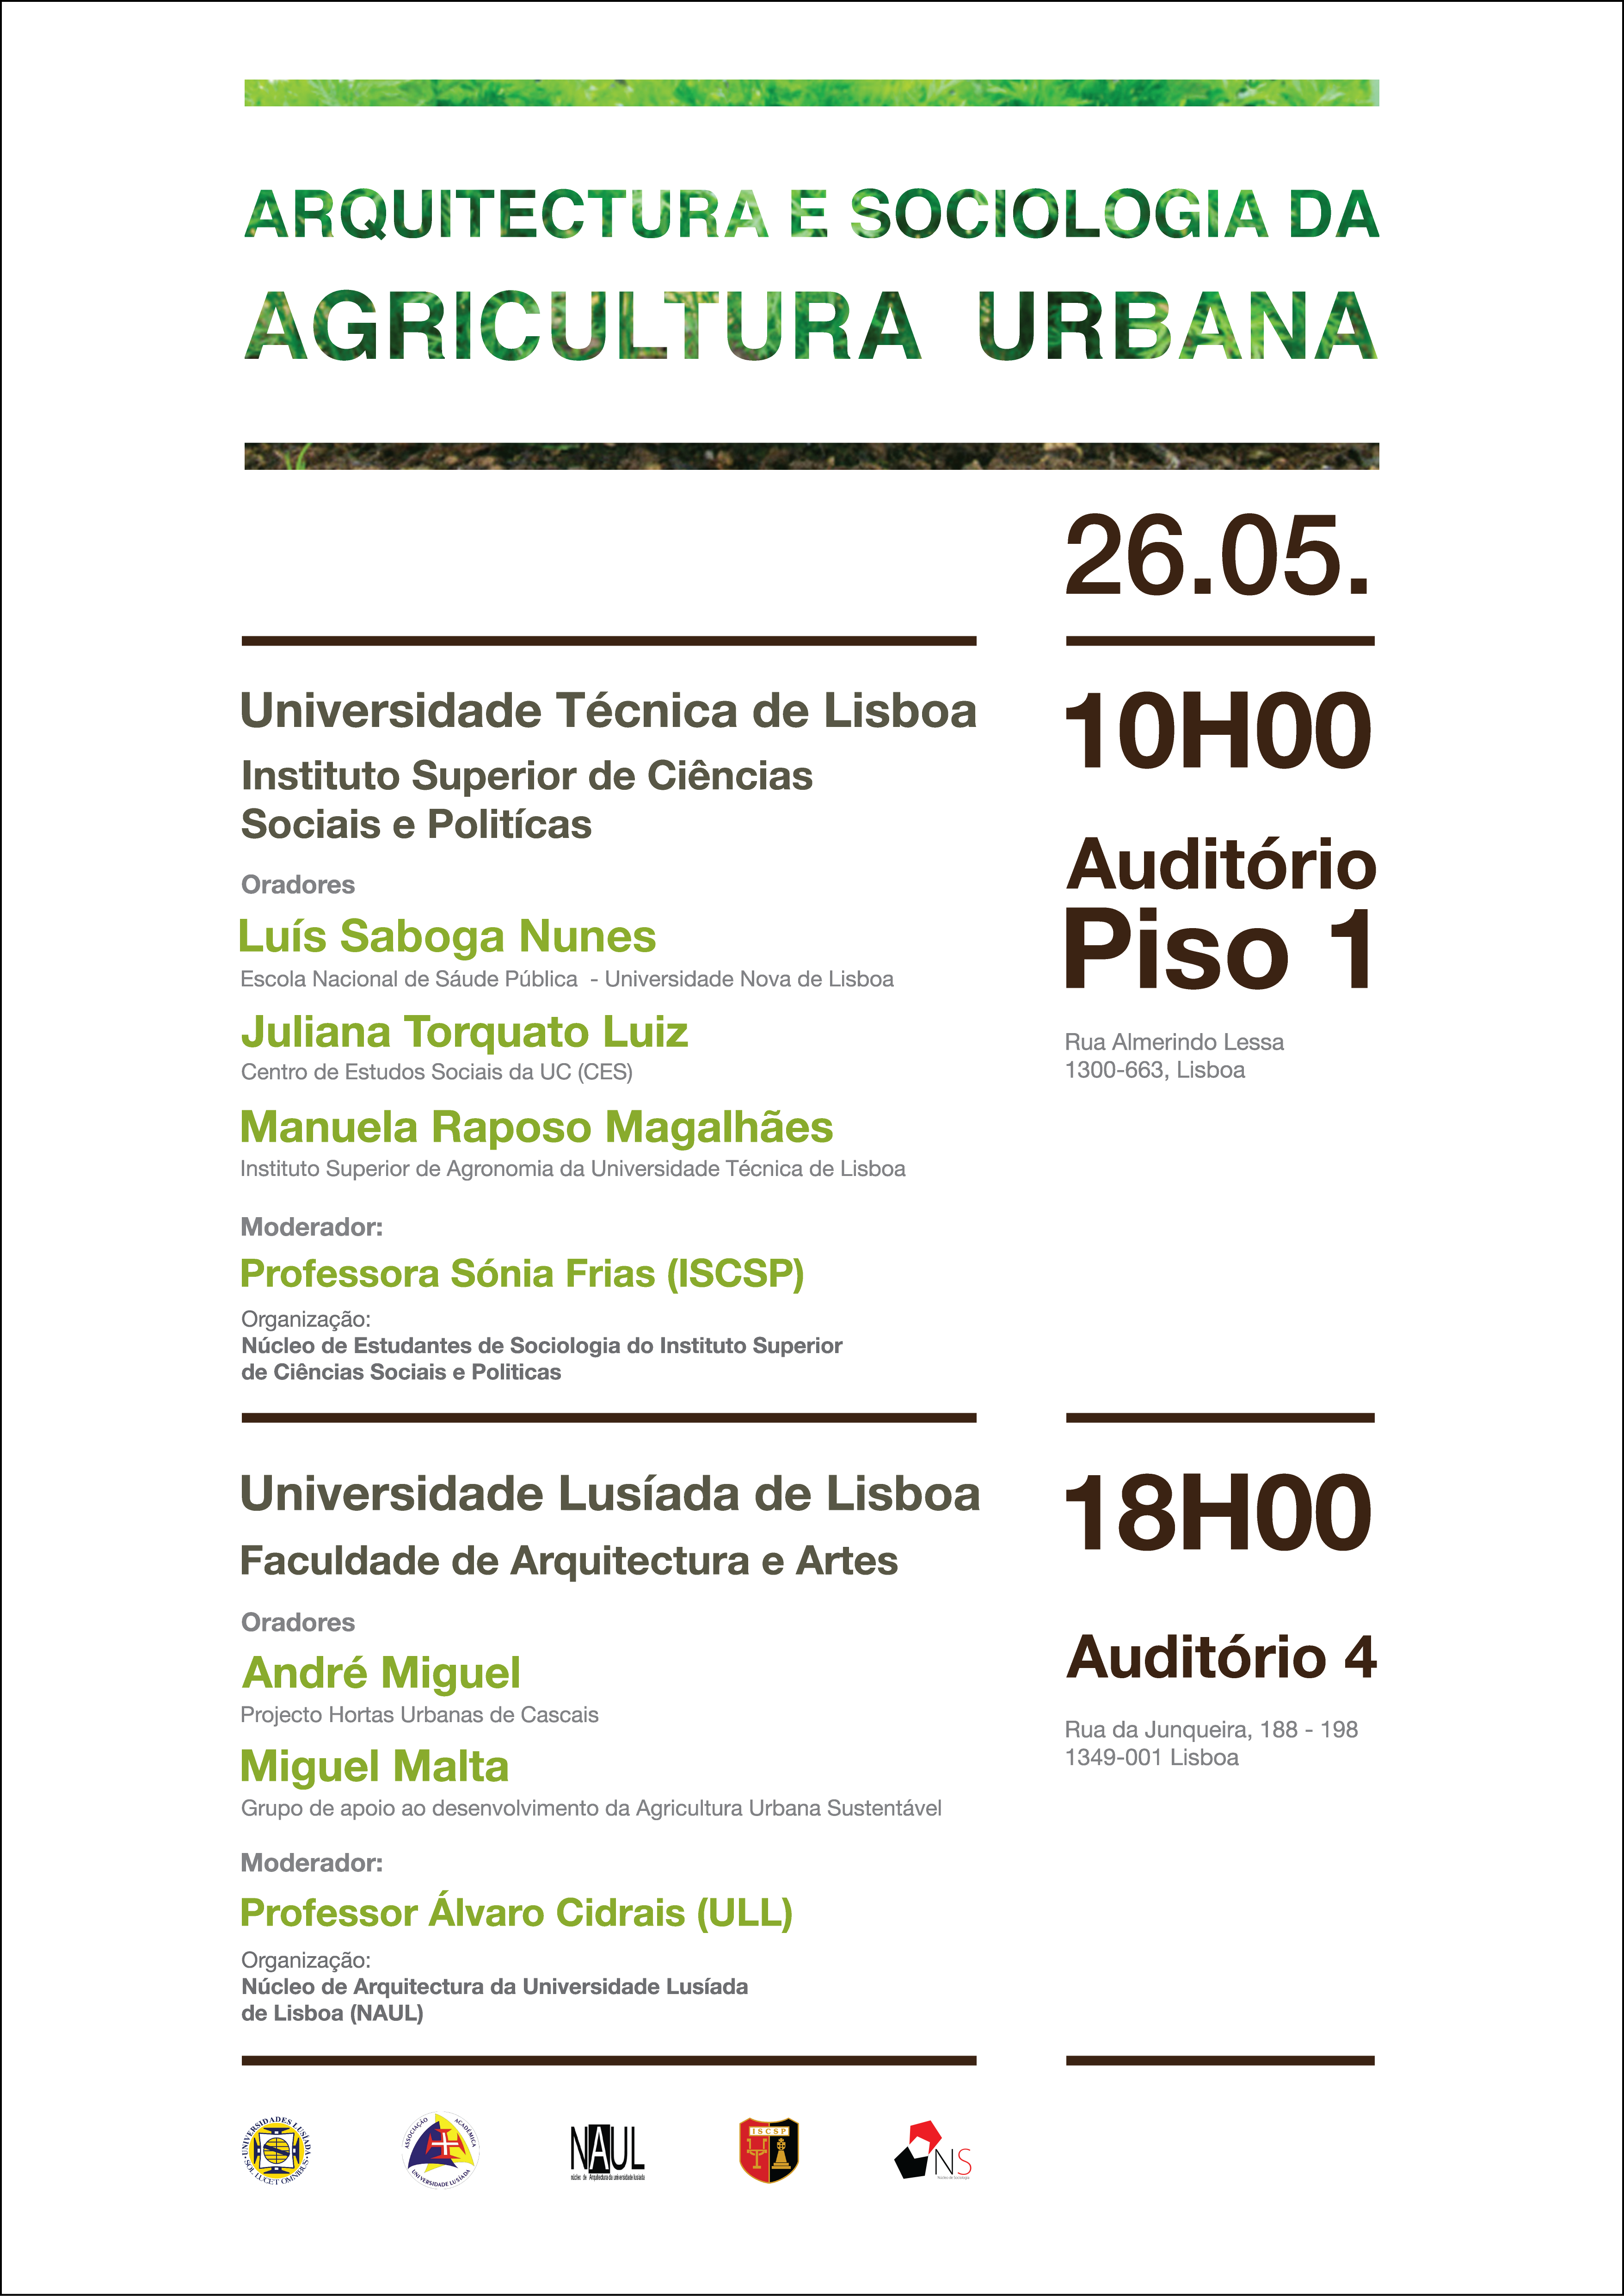 Arquitectura e sociologia da agricultura urbana ciclo de for Arquitectura tecnica ull